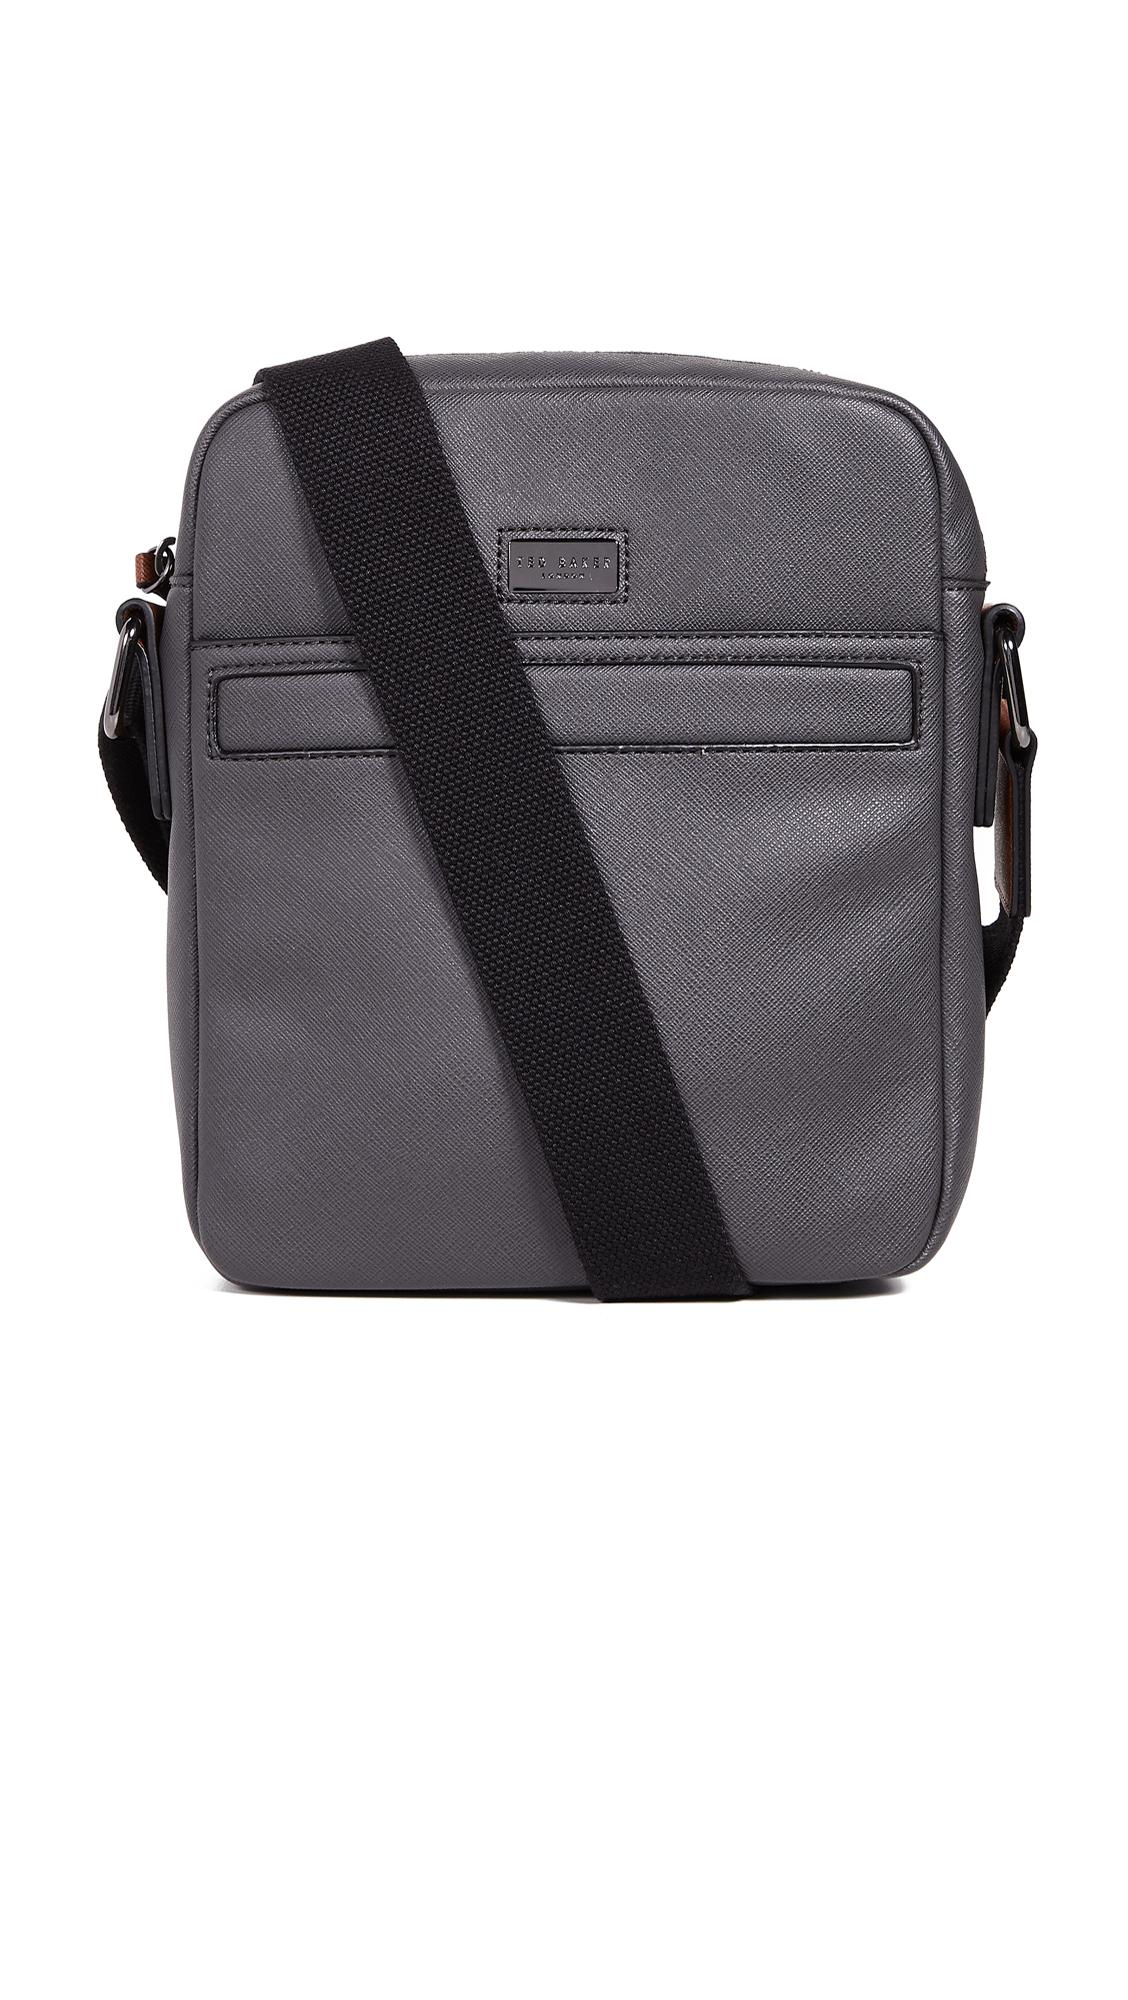 bea3b191db10 Ted Baker Gomera Cross Body Bag in Gray for Men - Lyst